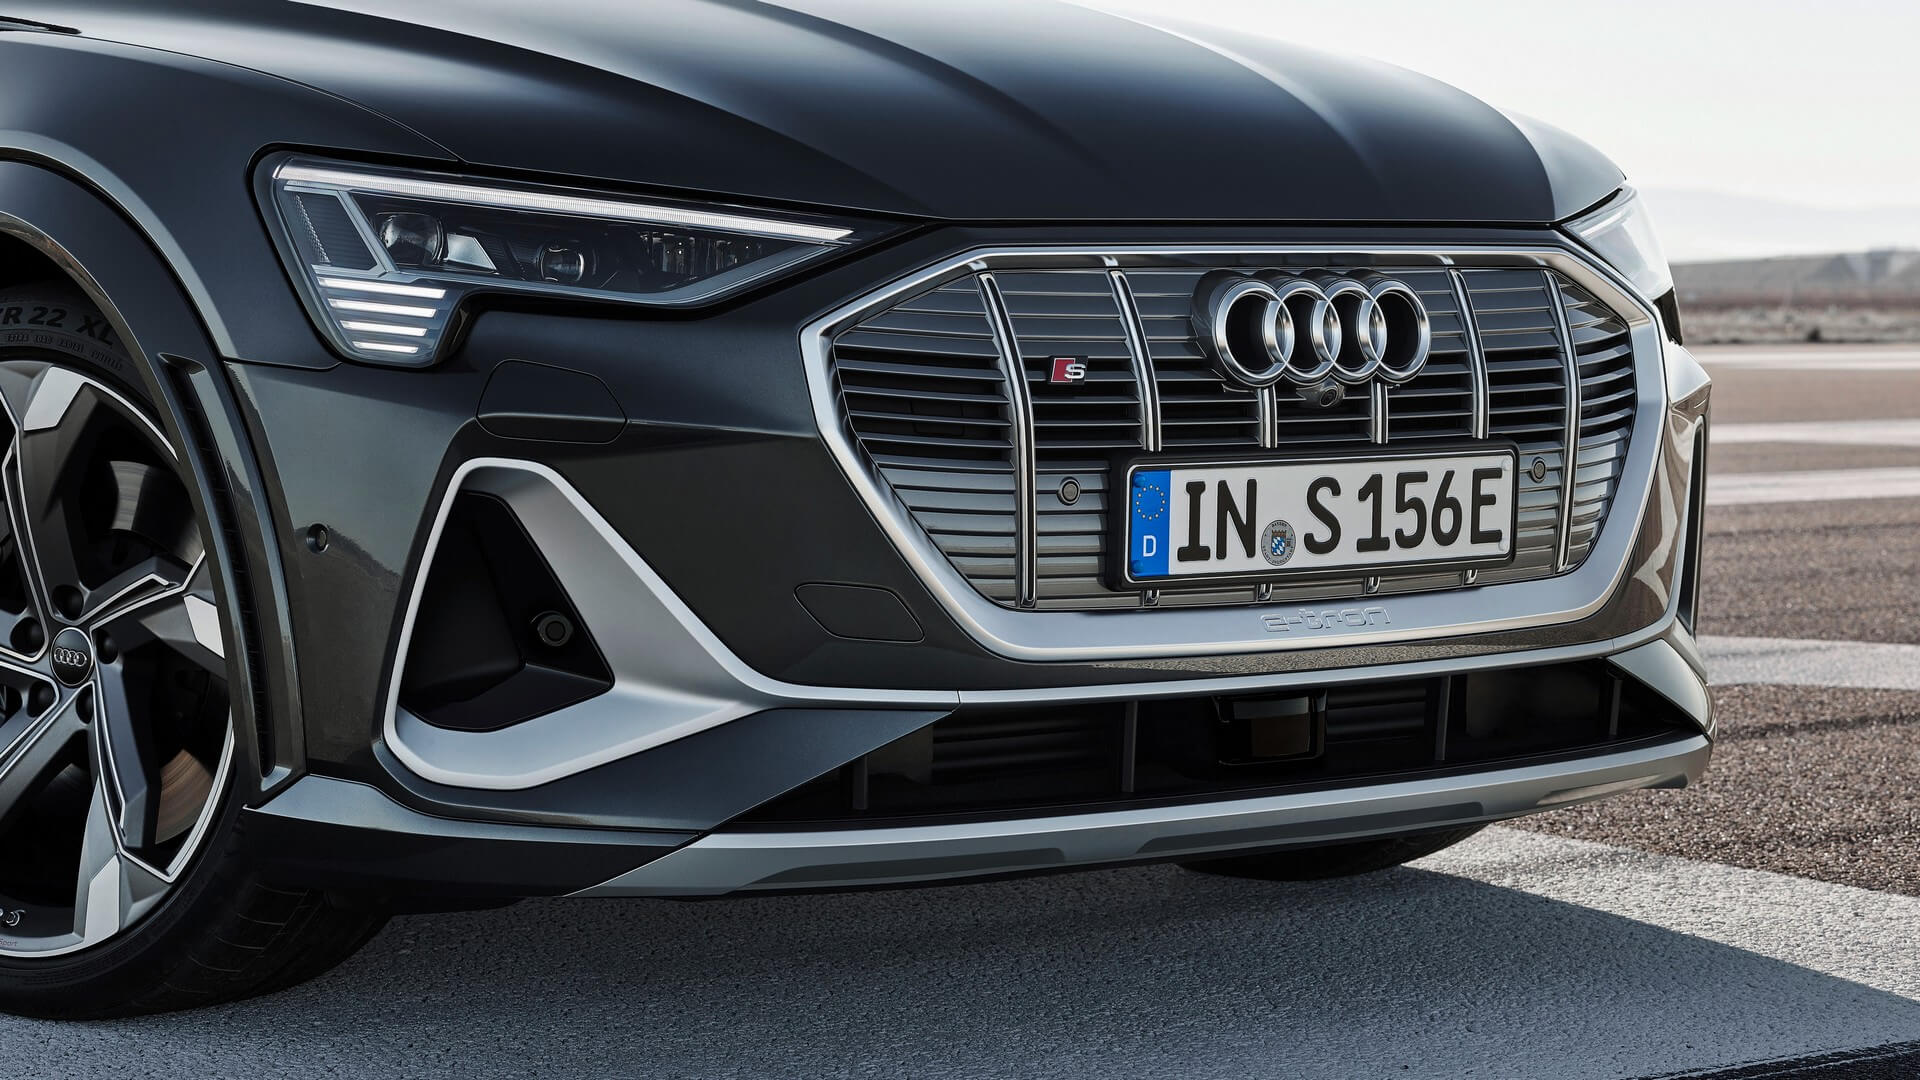 Audi-E-Tron-S-and-E-Tron-S-Sportback-2020-102